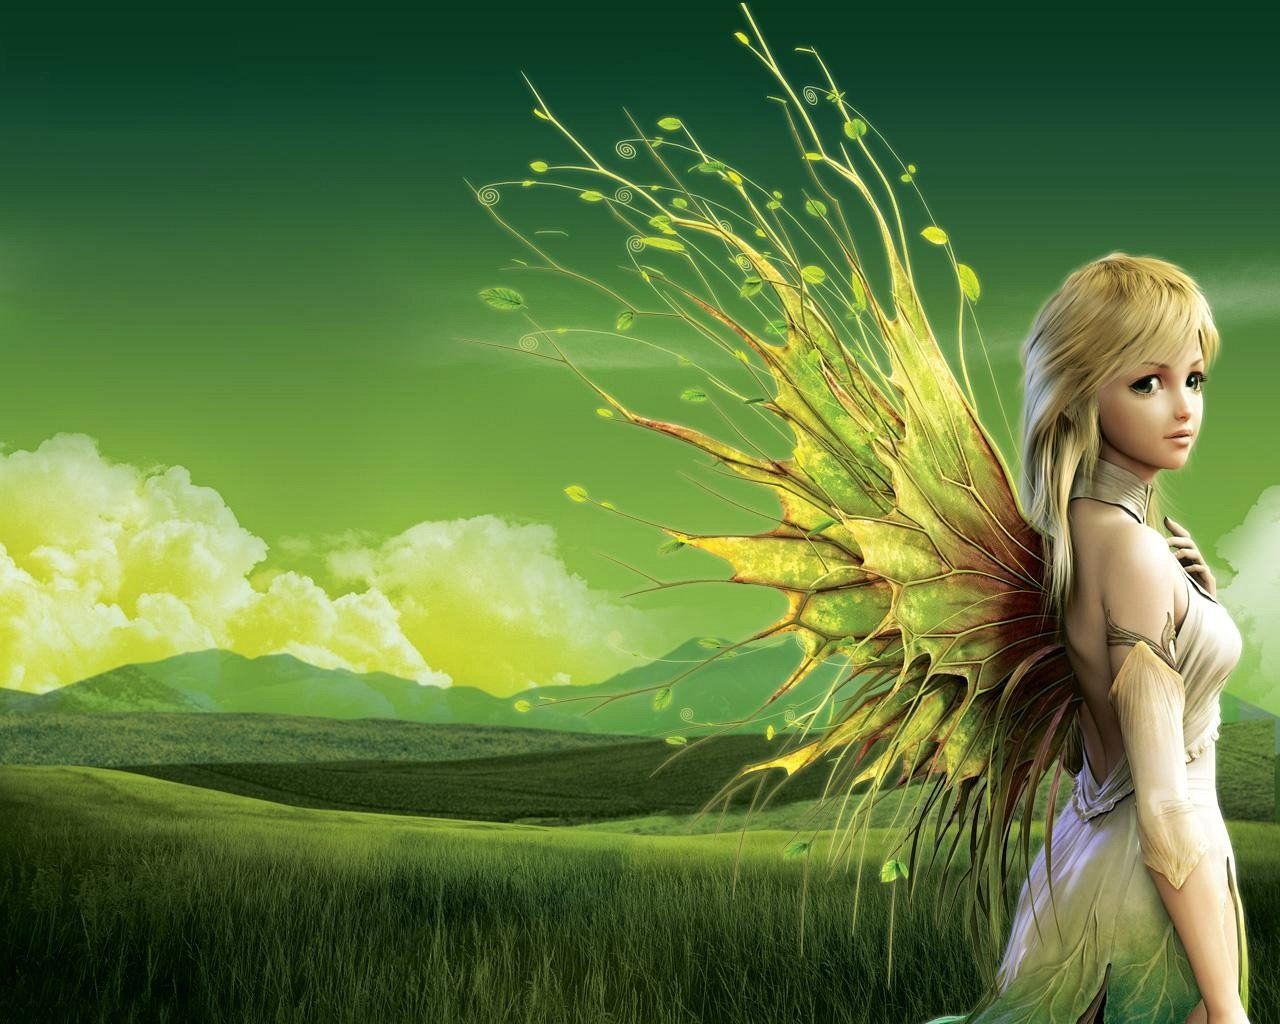 high definition beautiful fairies wallpaper 4k ultra hd photos